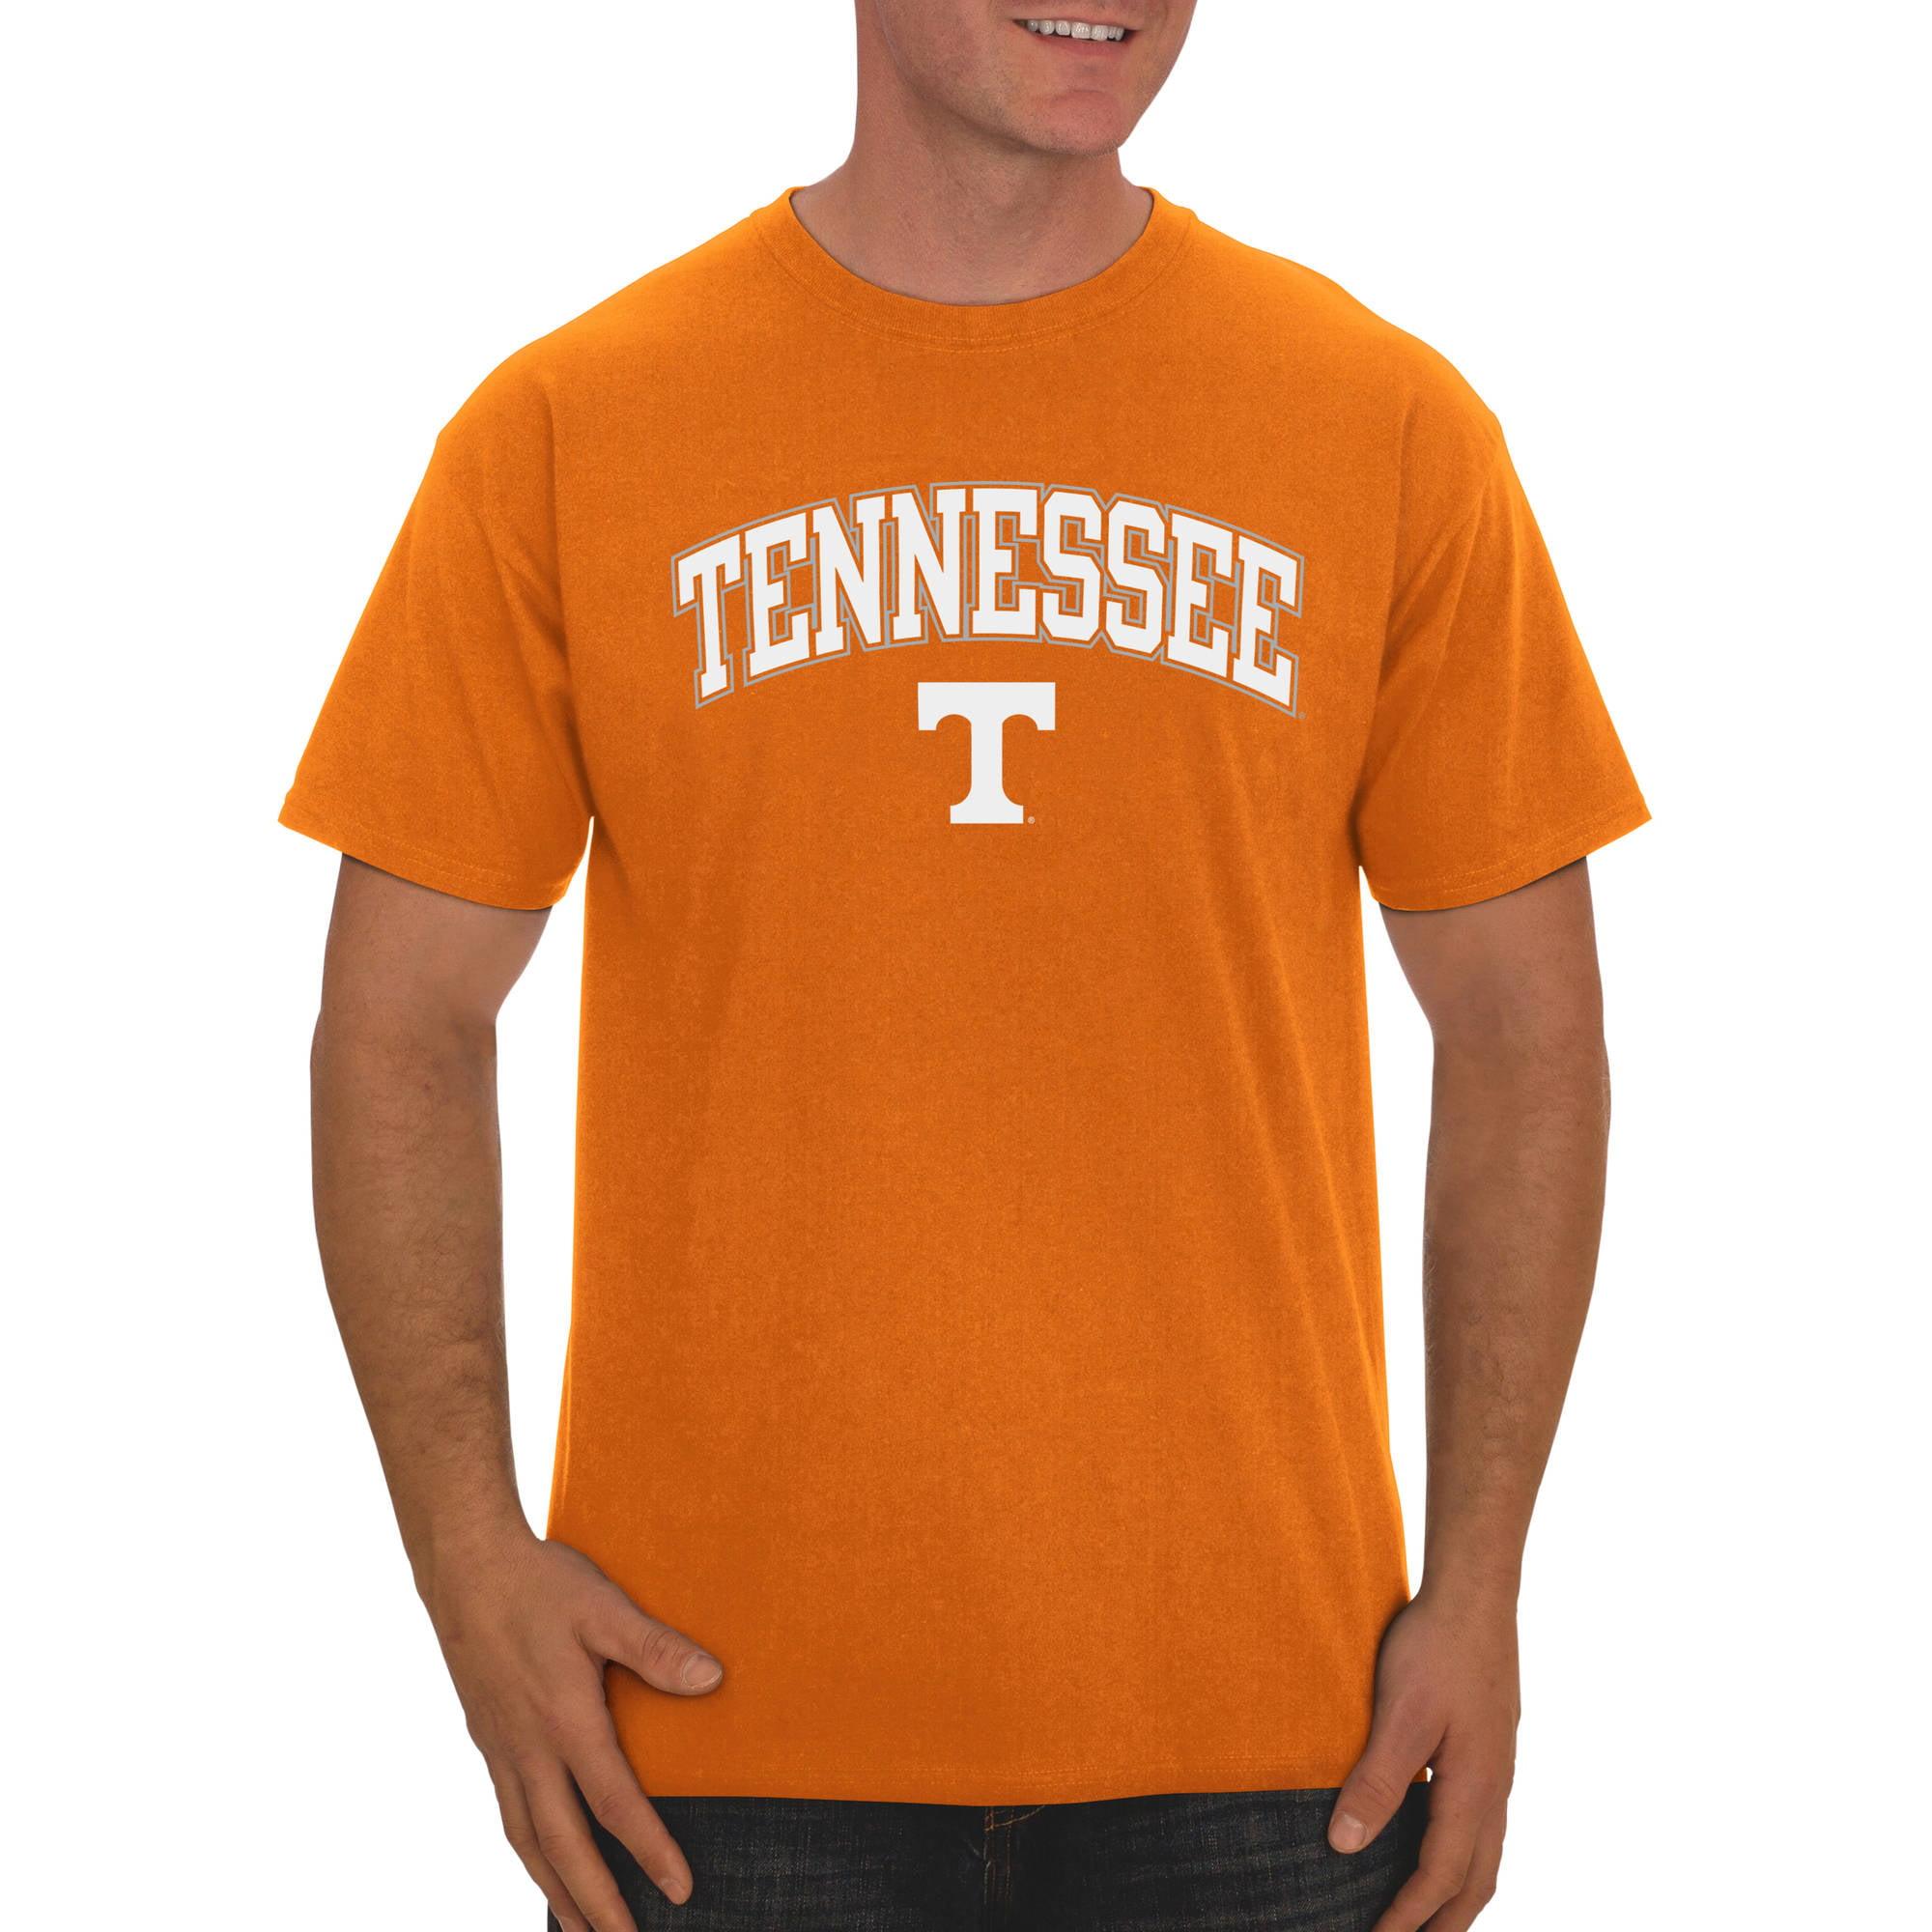 NCAA Tennessee Volunteers, Men's Classic Cotton T-Shirt